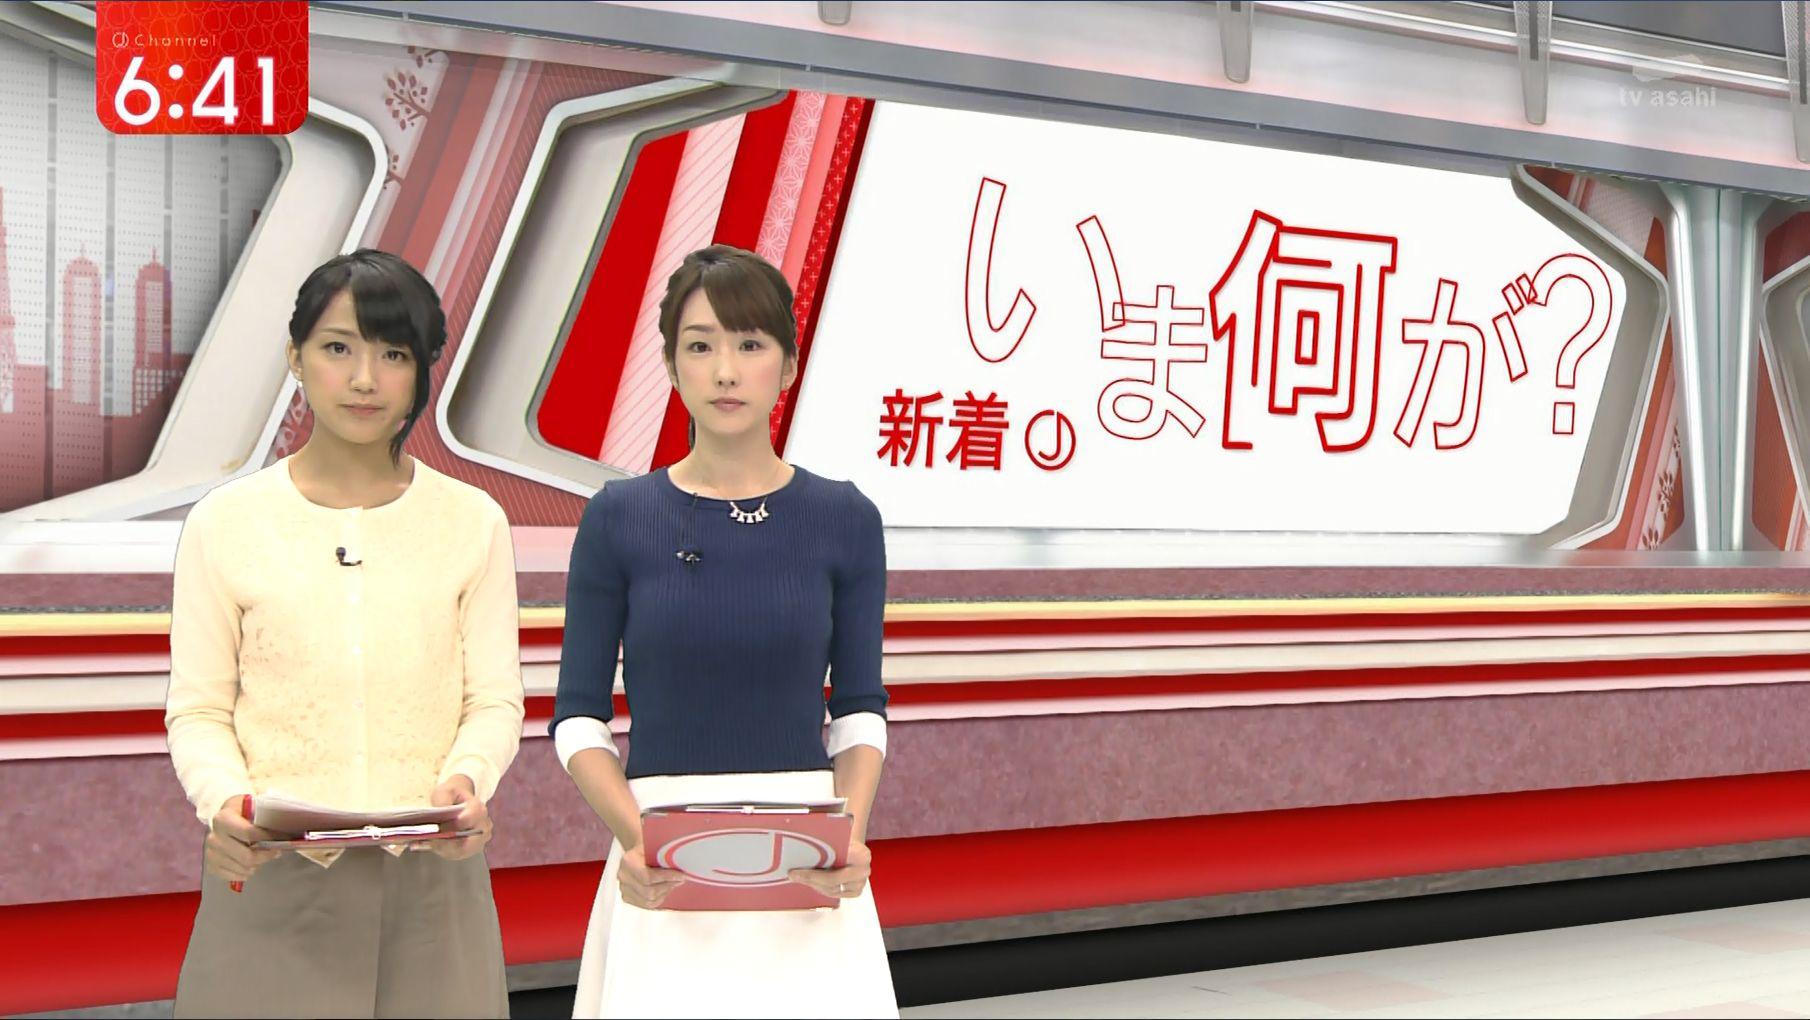 【テレ朝】 堂 真理子 103 【育休明け】©2ch.netYouTube動画>1本 ->画像>781枚